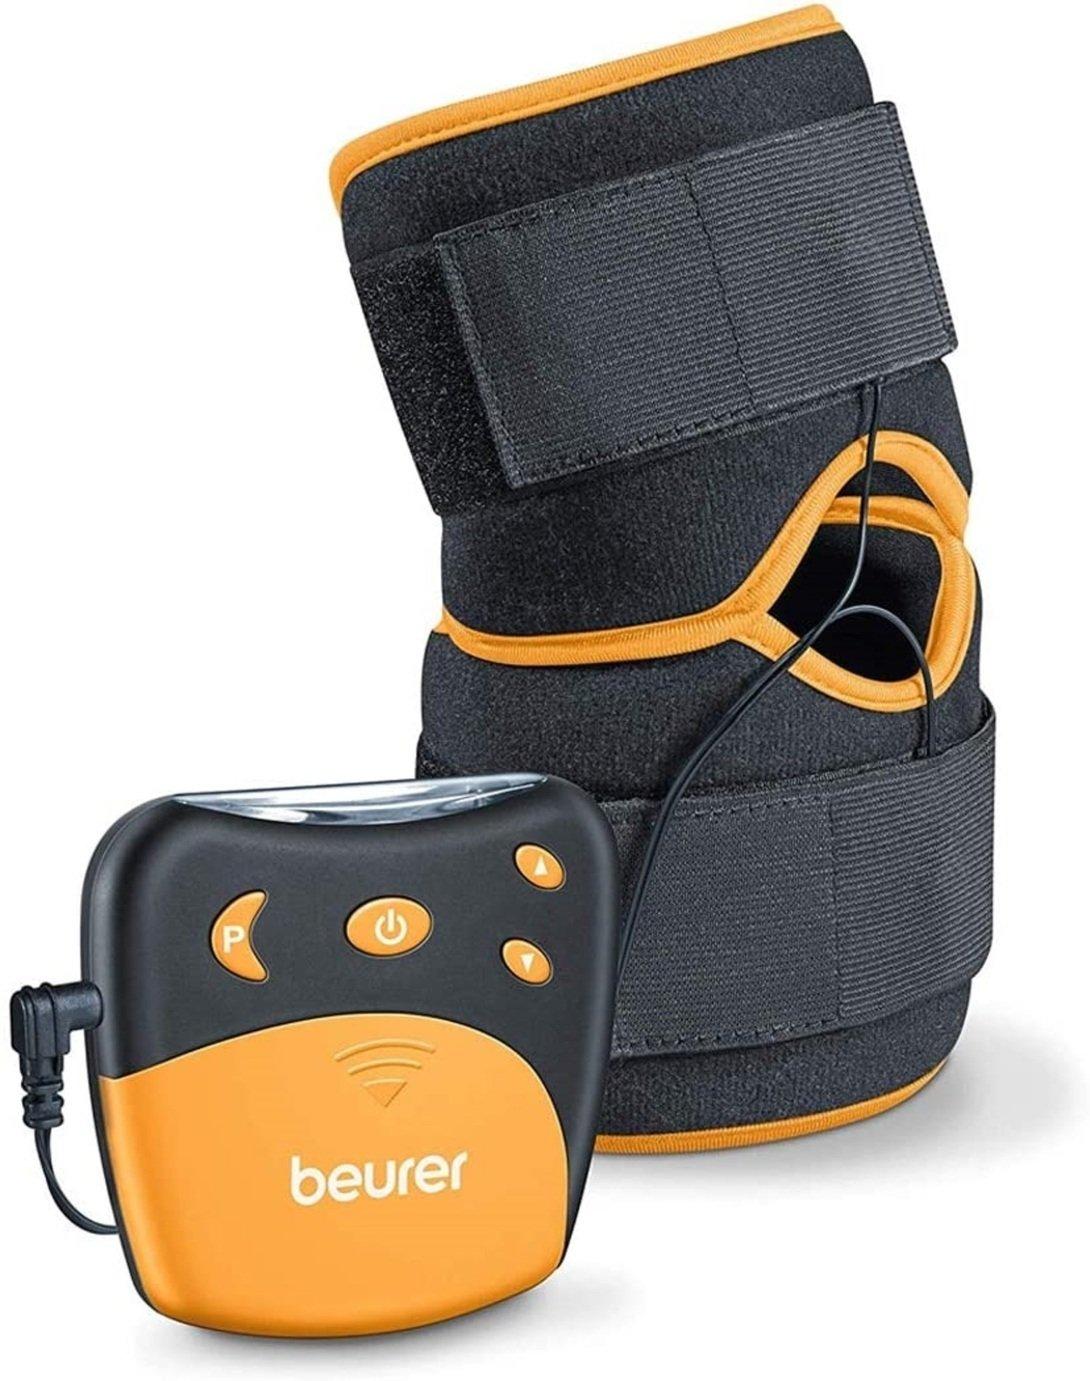 Beurer EM29 Knee & Elbow TENS Drug Free Pain Relief